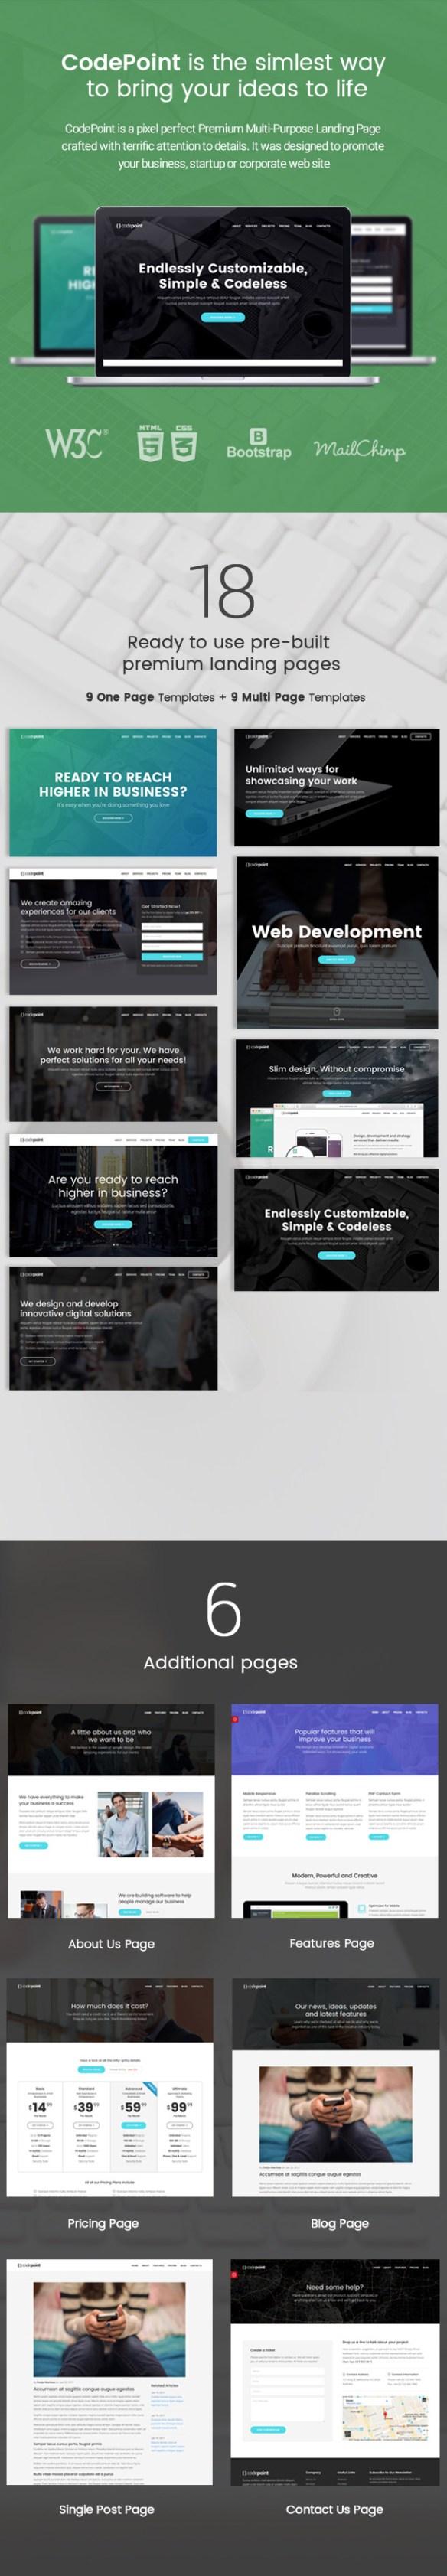 codepoint wordpress theme